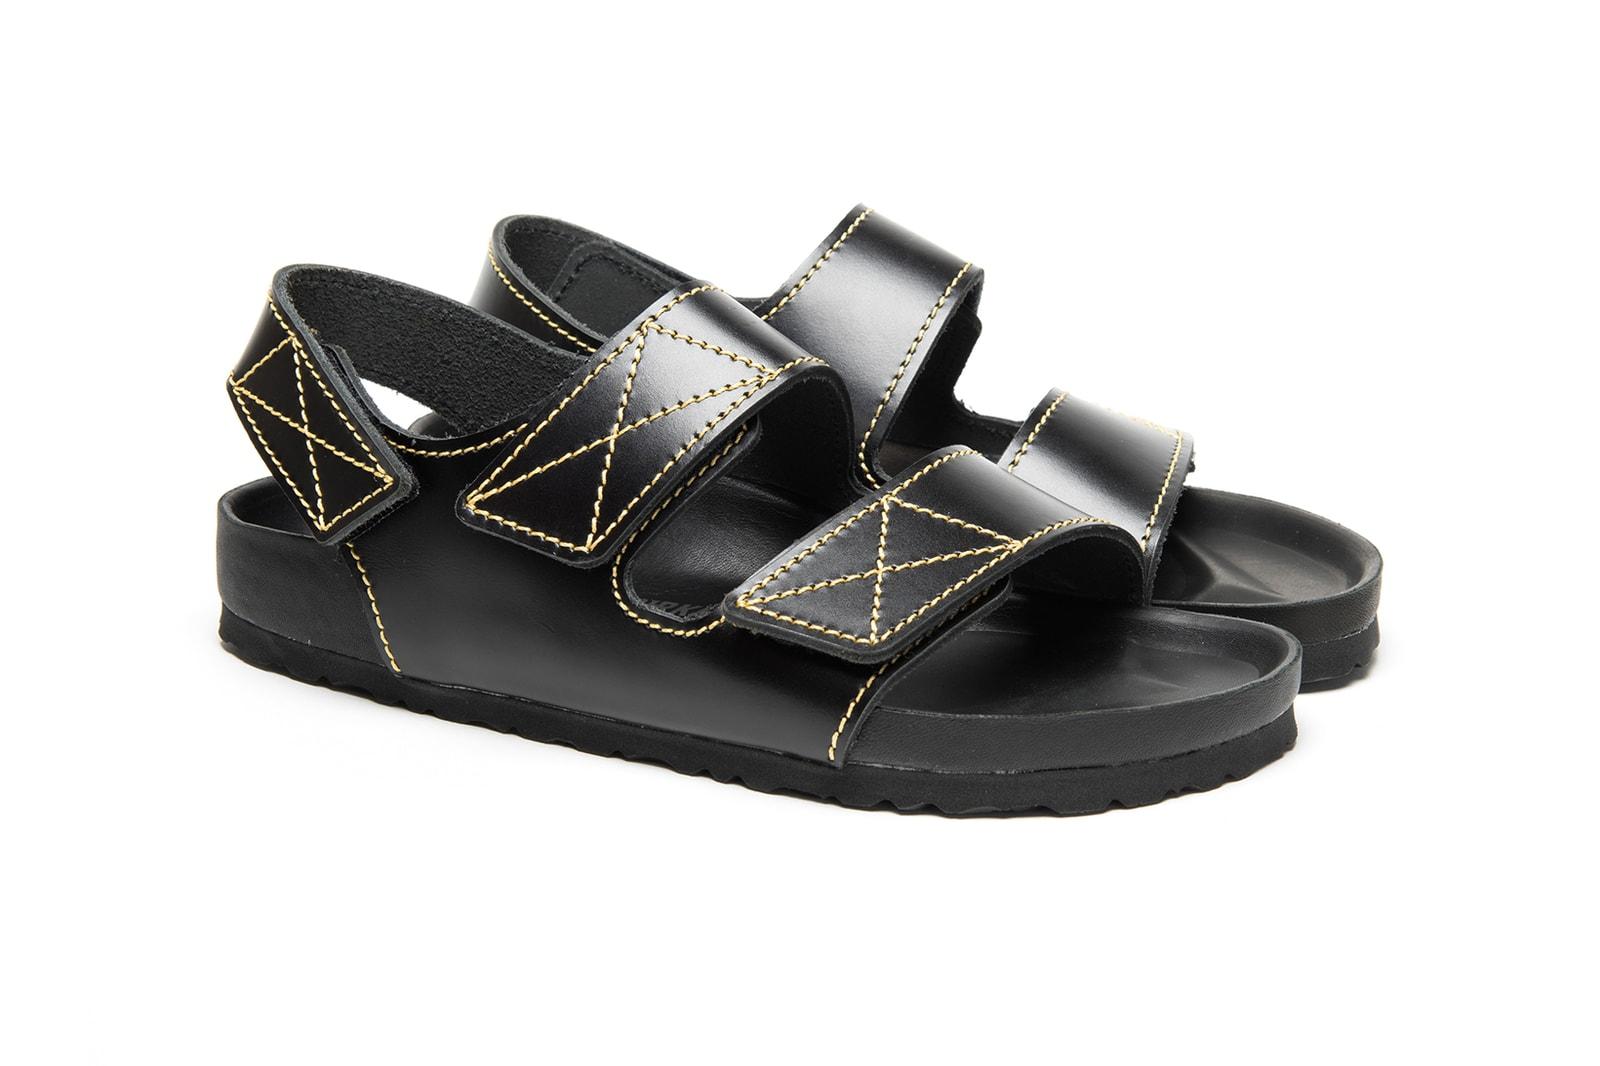 birkenstock proenza schouler juergen teller peter miles collaboration arizona milano sandals unisex shoes footwear yellow white black silver